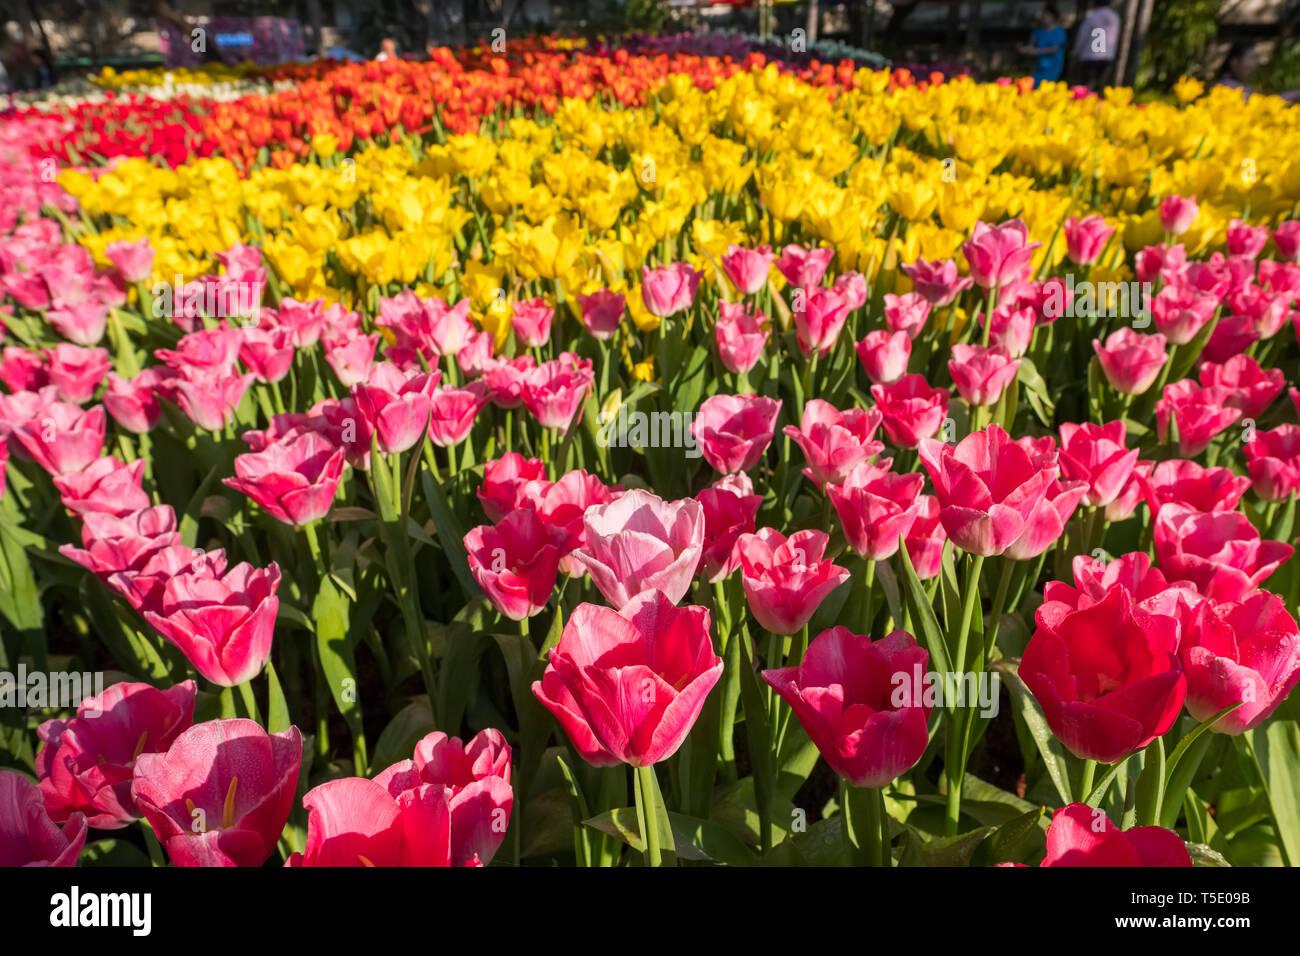 Beautiful varicolored tulips close-up - Stock Image